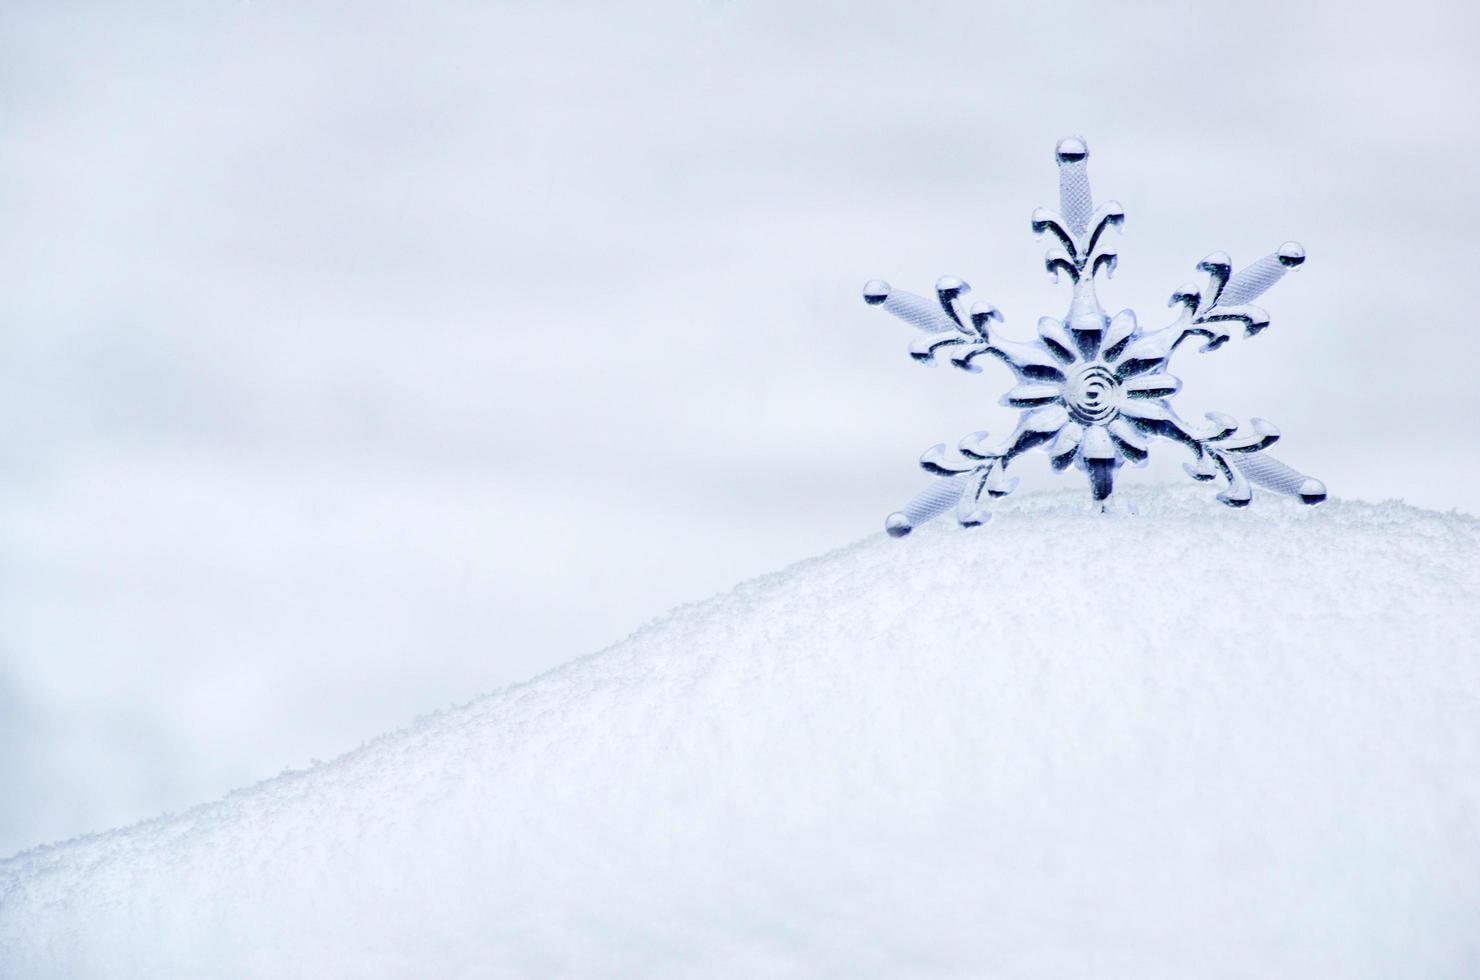 fondo de nieve copo de nieve foto